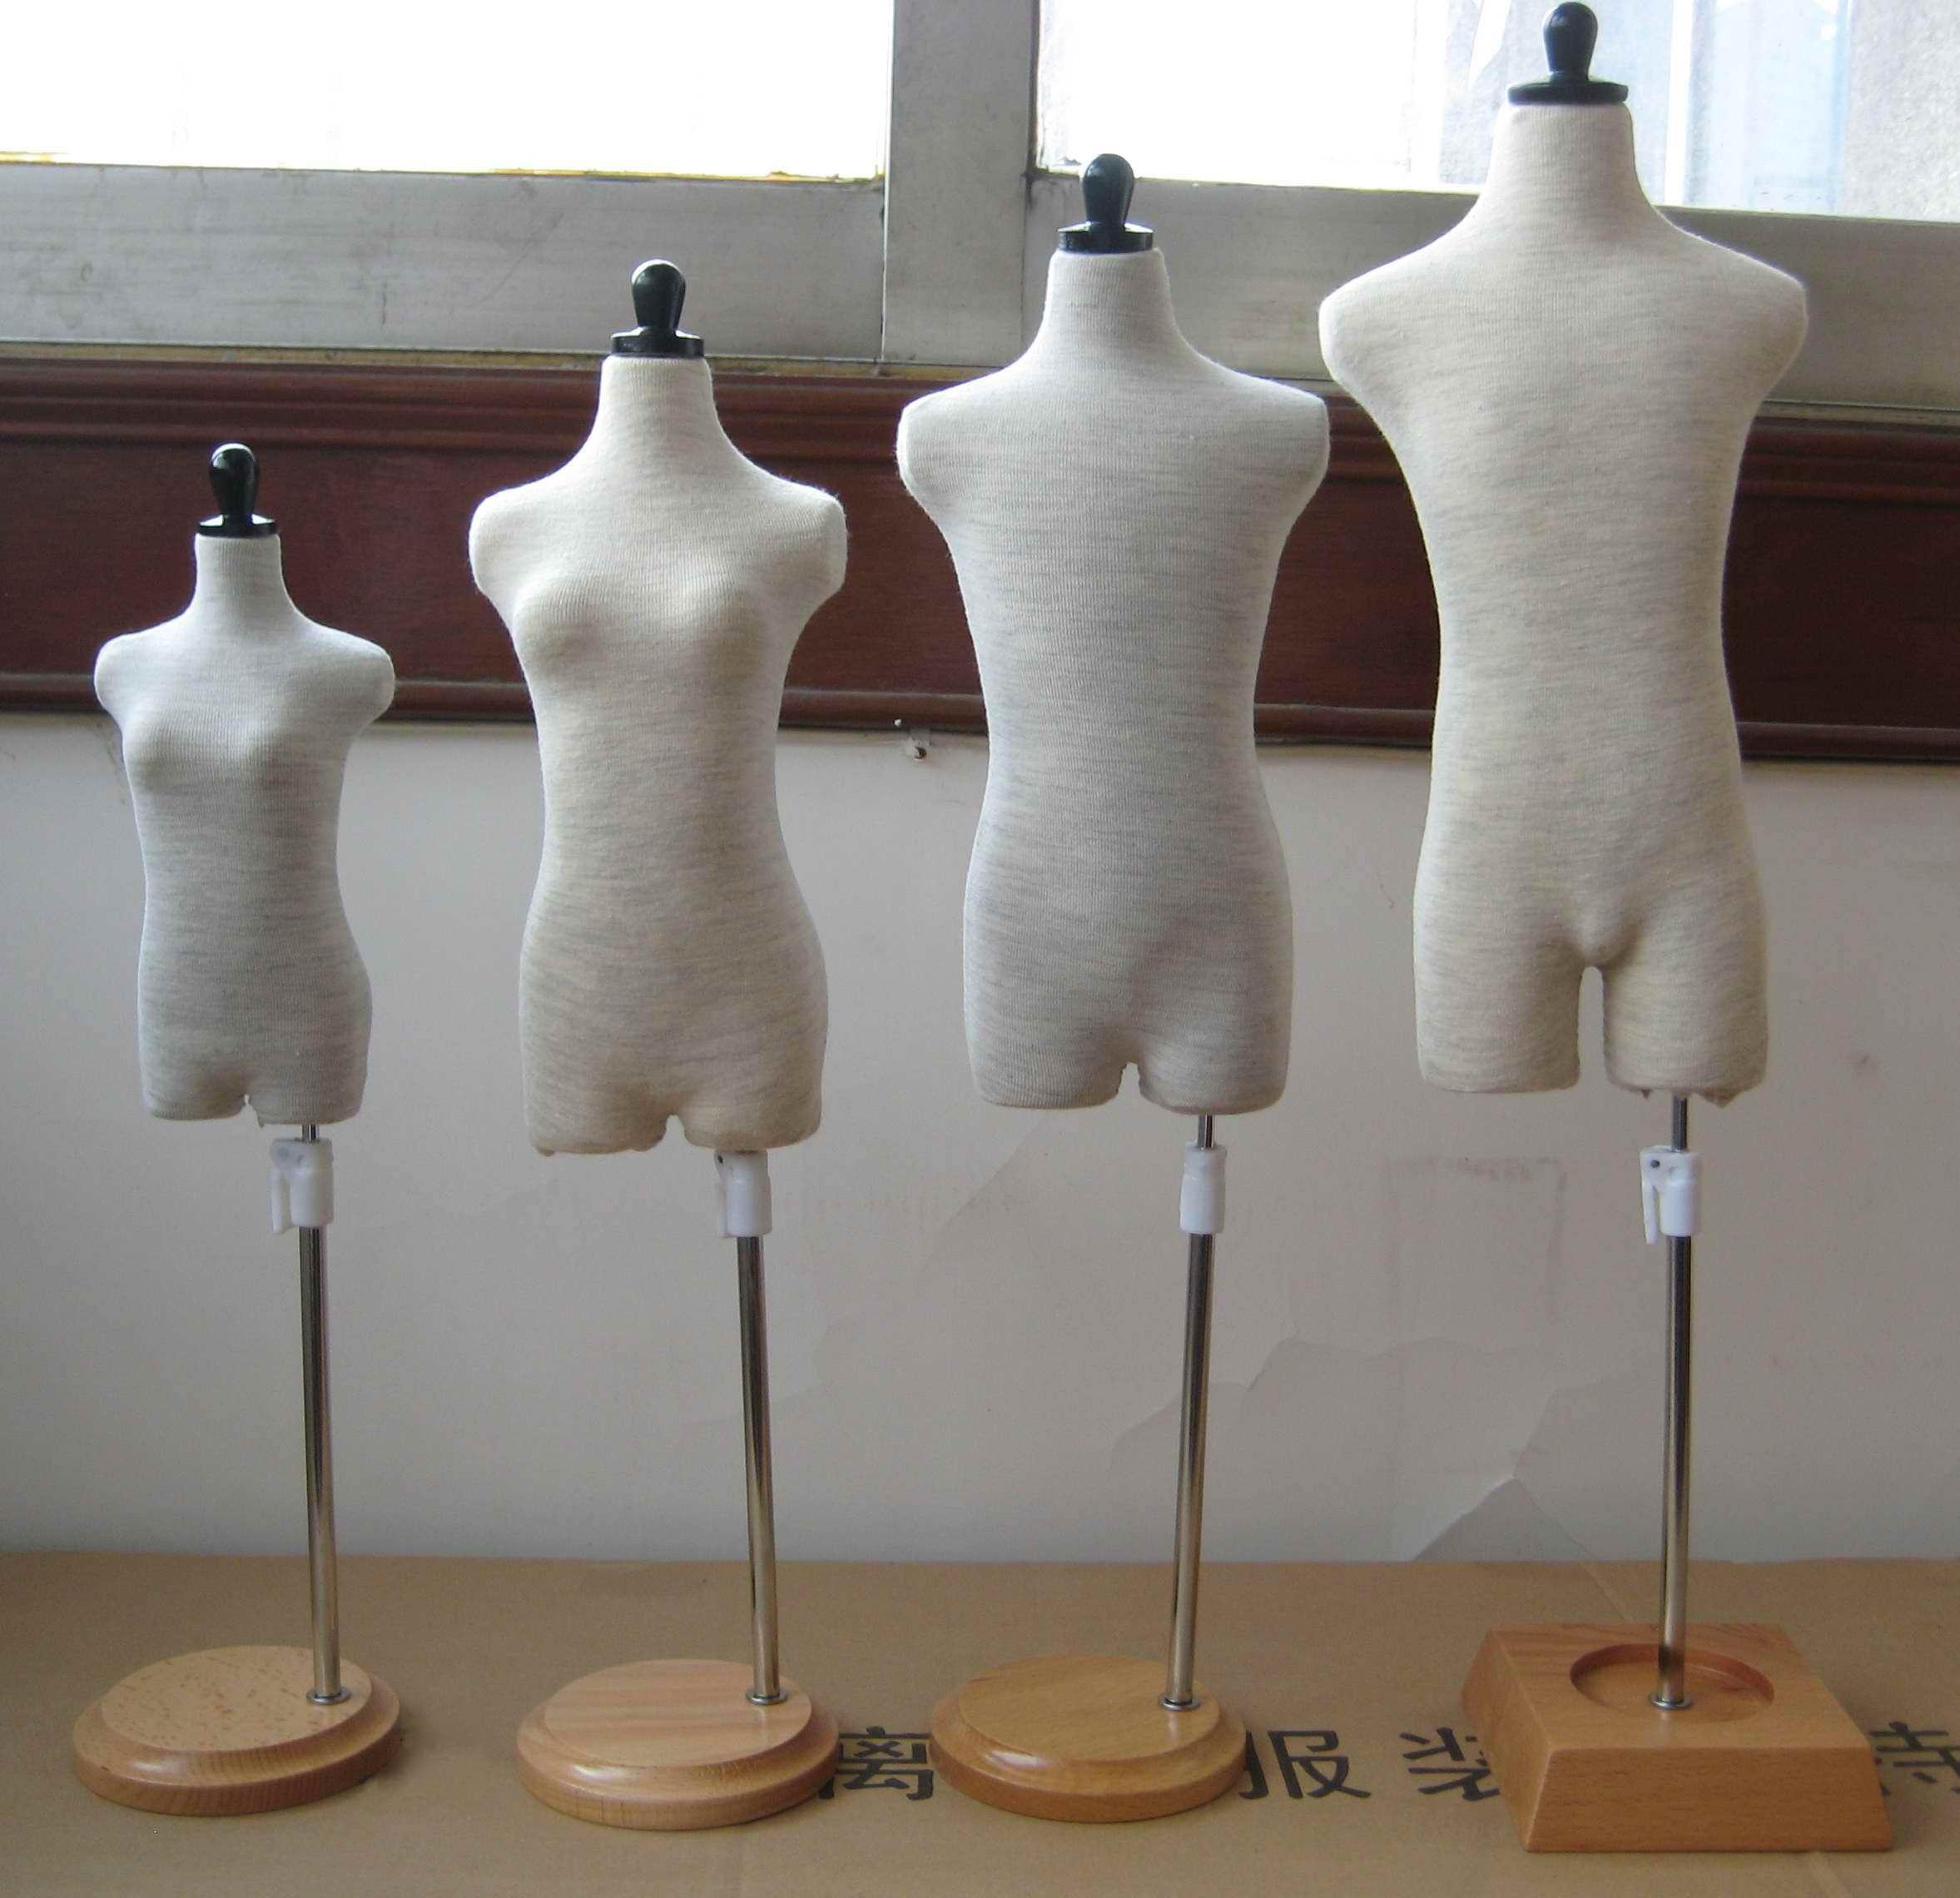 BJD人台1/3人台3分制衣专用人台娃衣立裁模特4分立裁人台人体模型